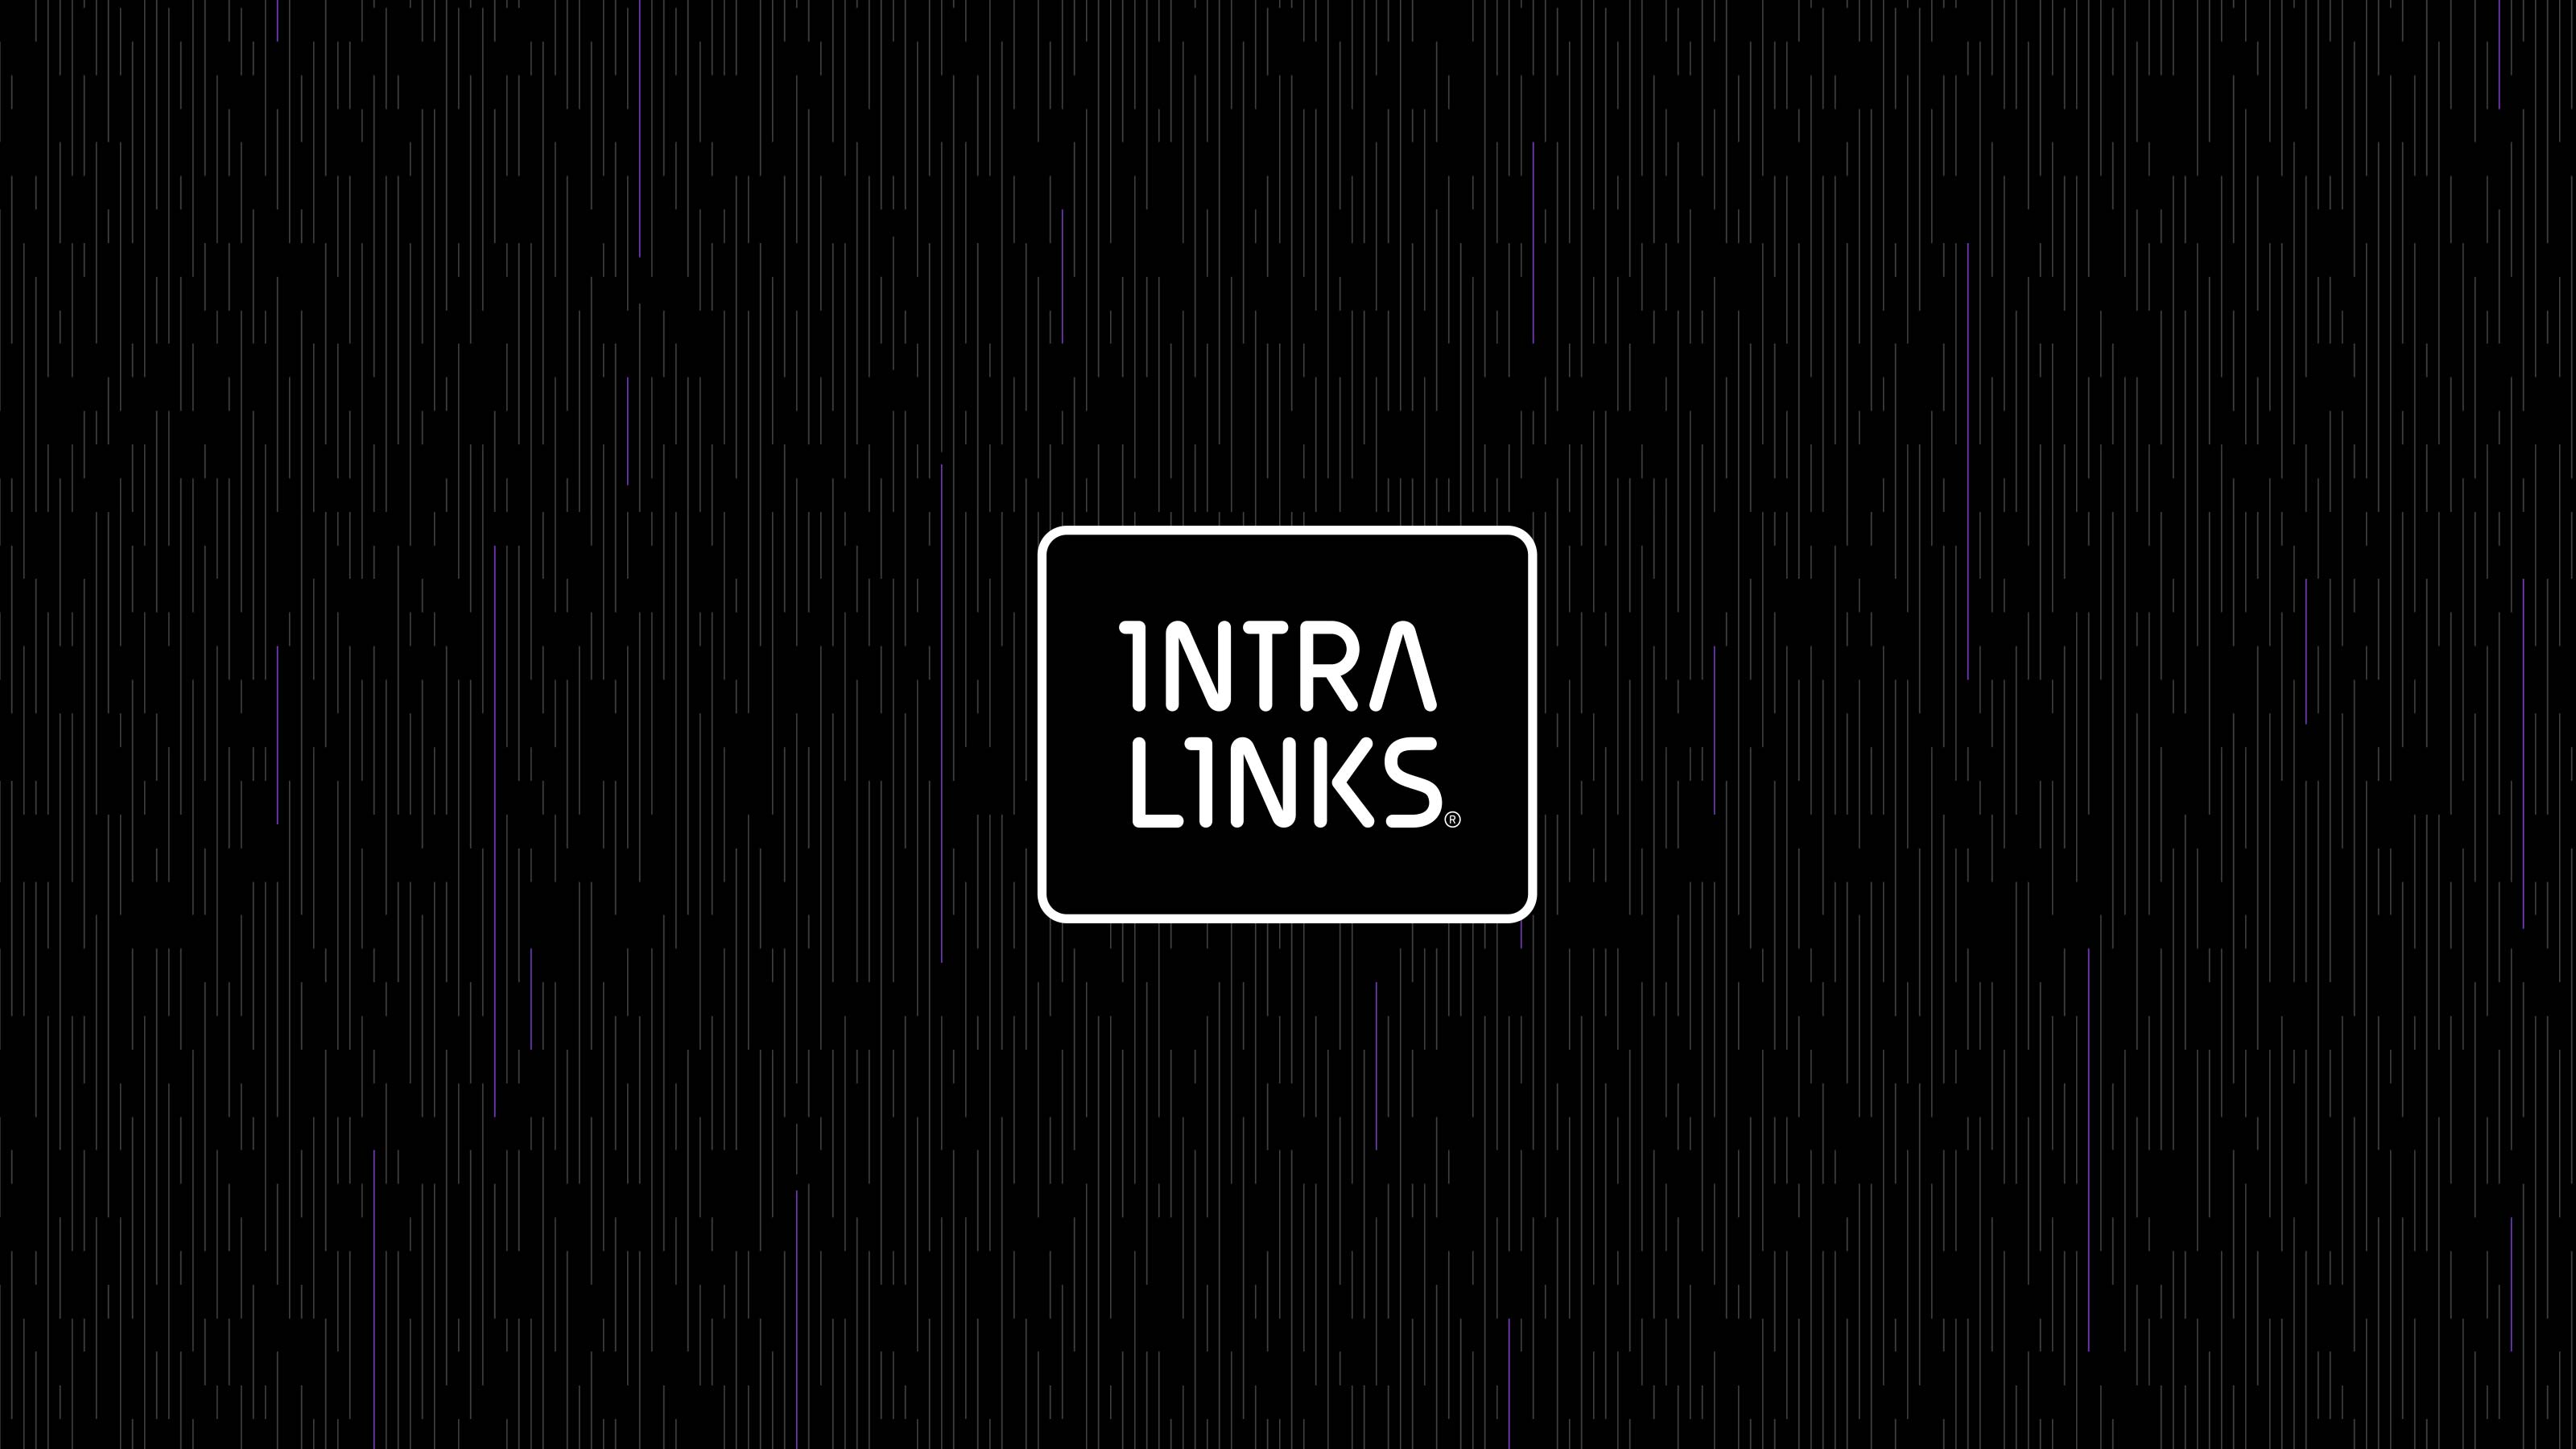 Intralinks_Brand_logo_background